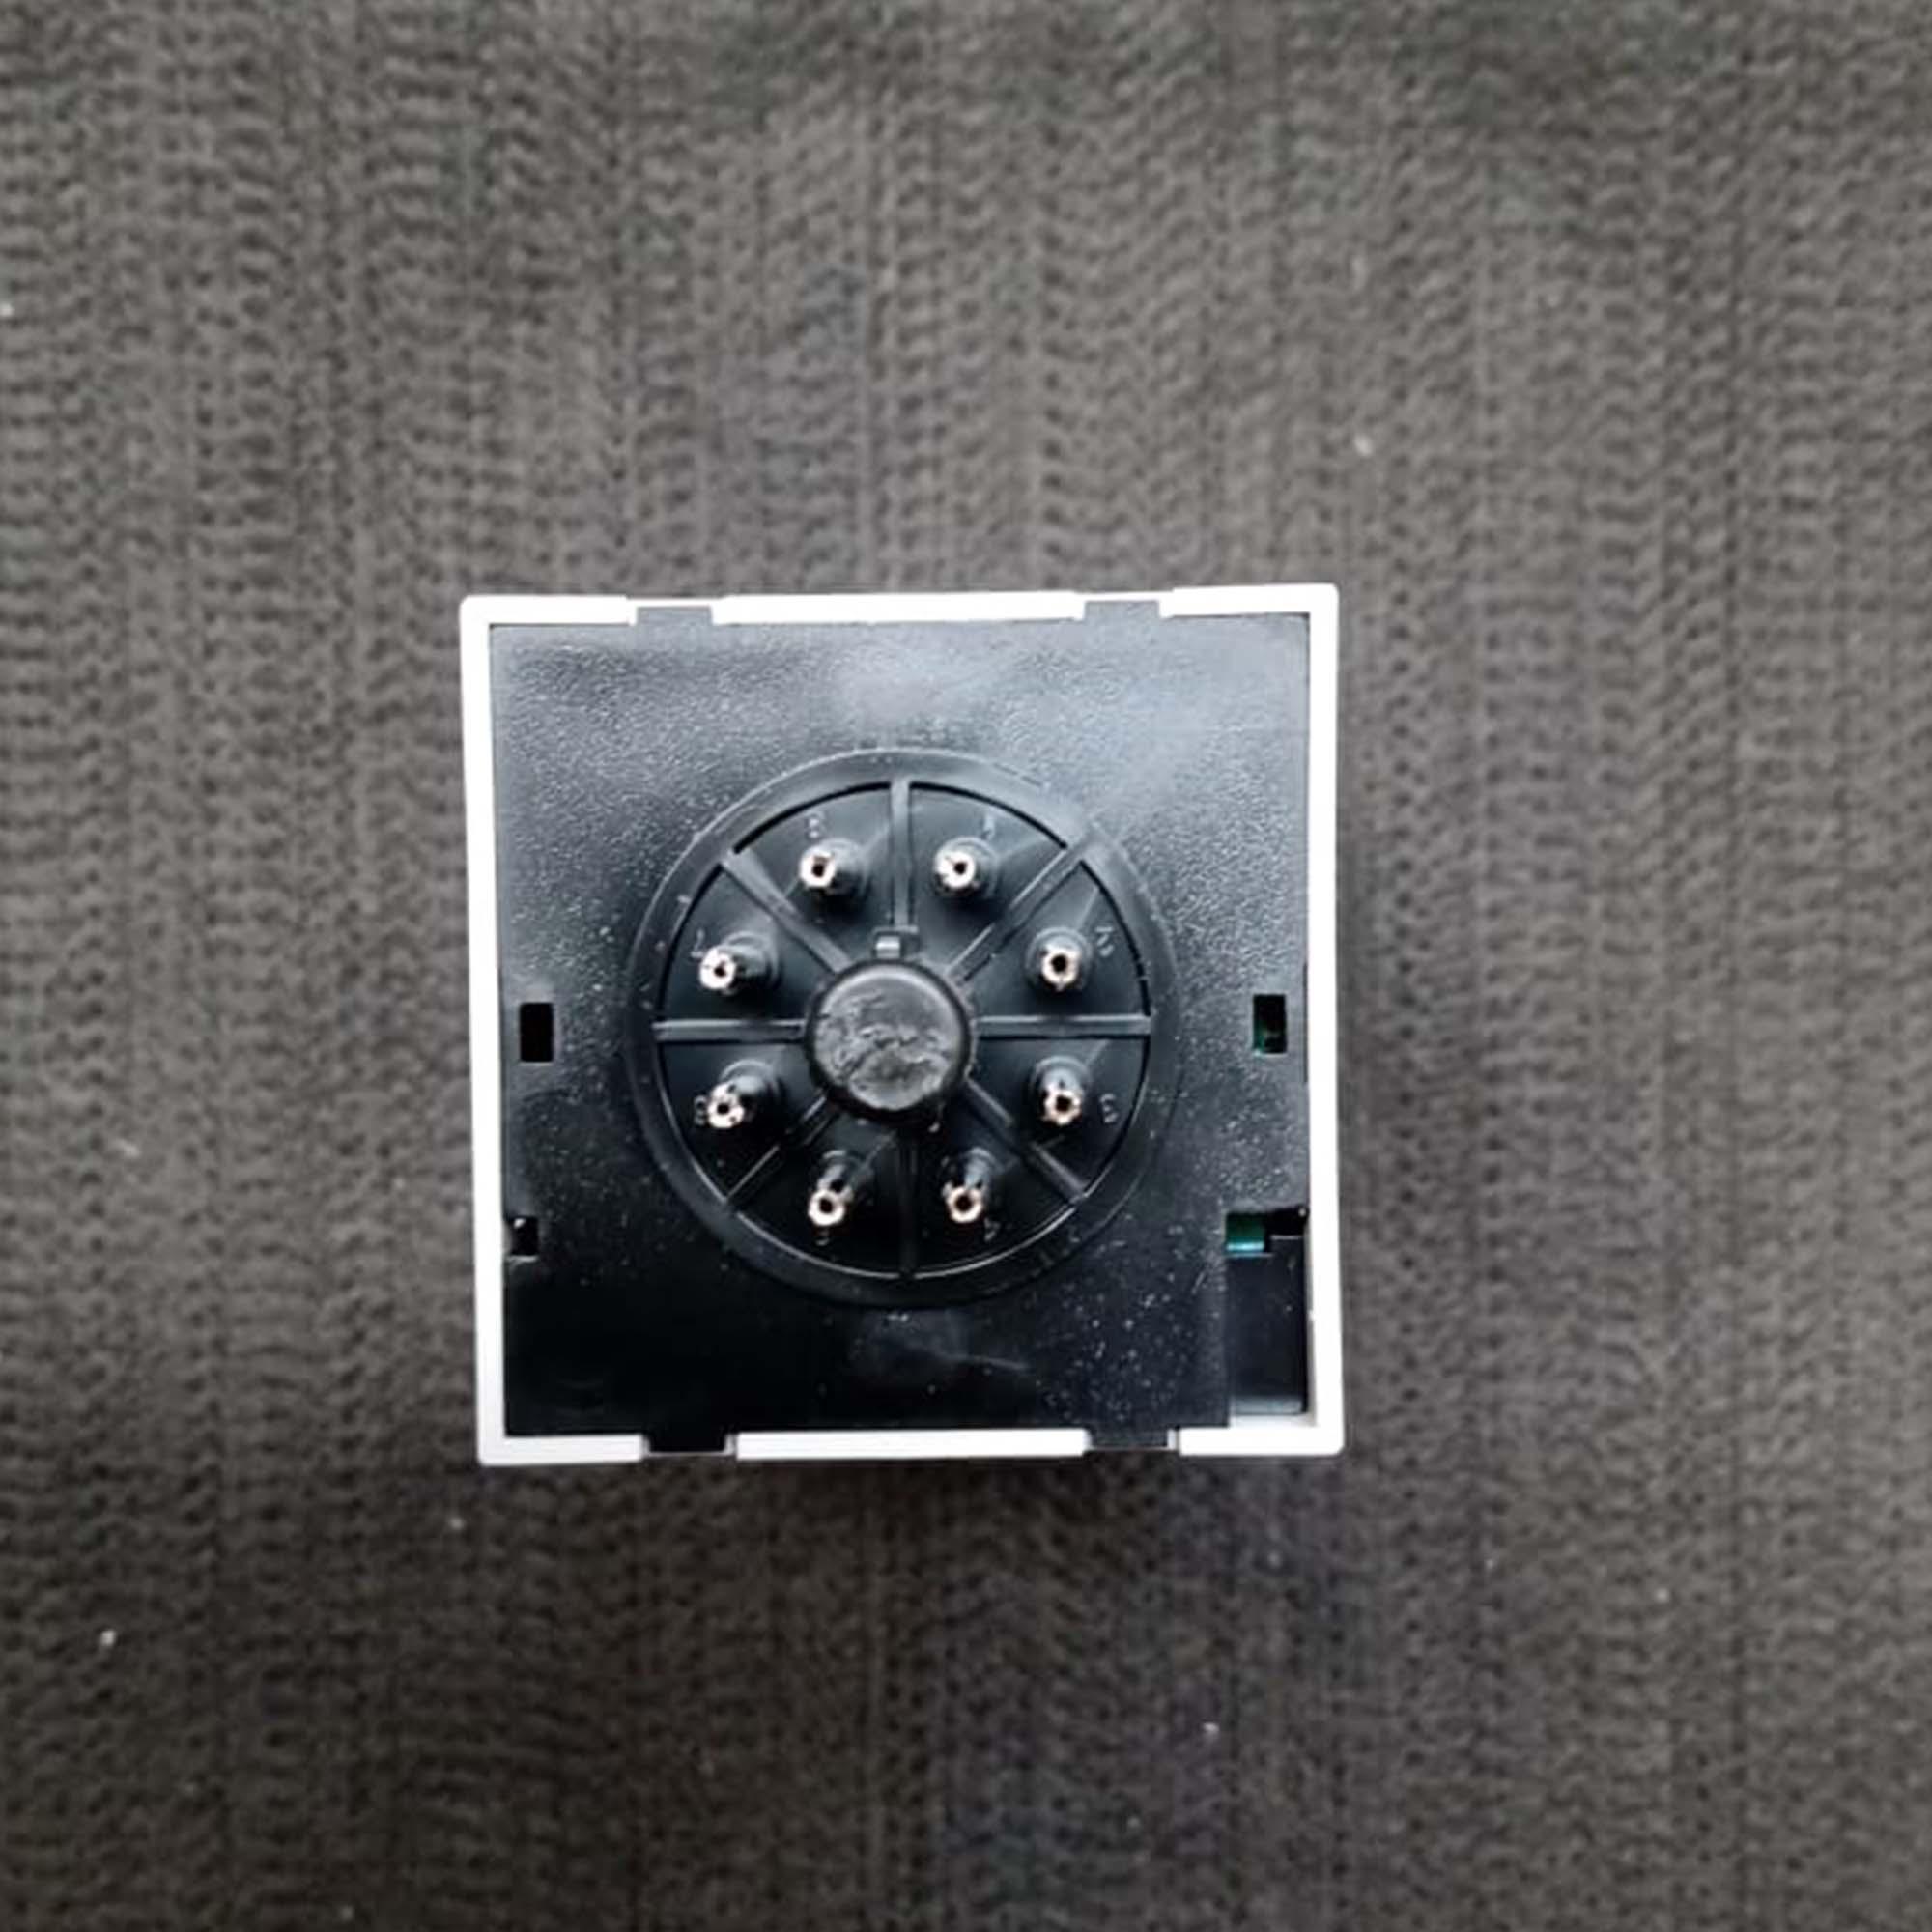 14910 - TEMPORIZADOR 3S-3H 220V 5A